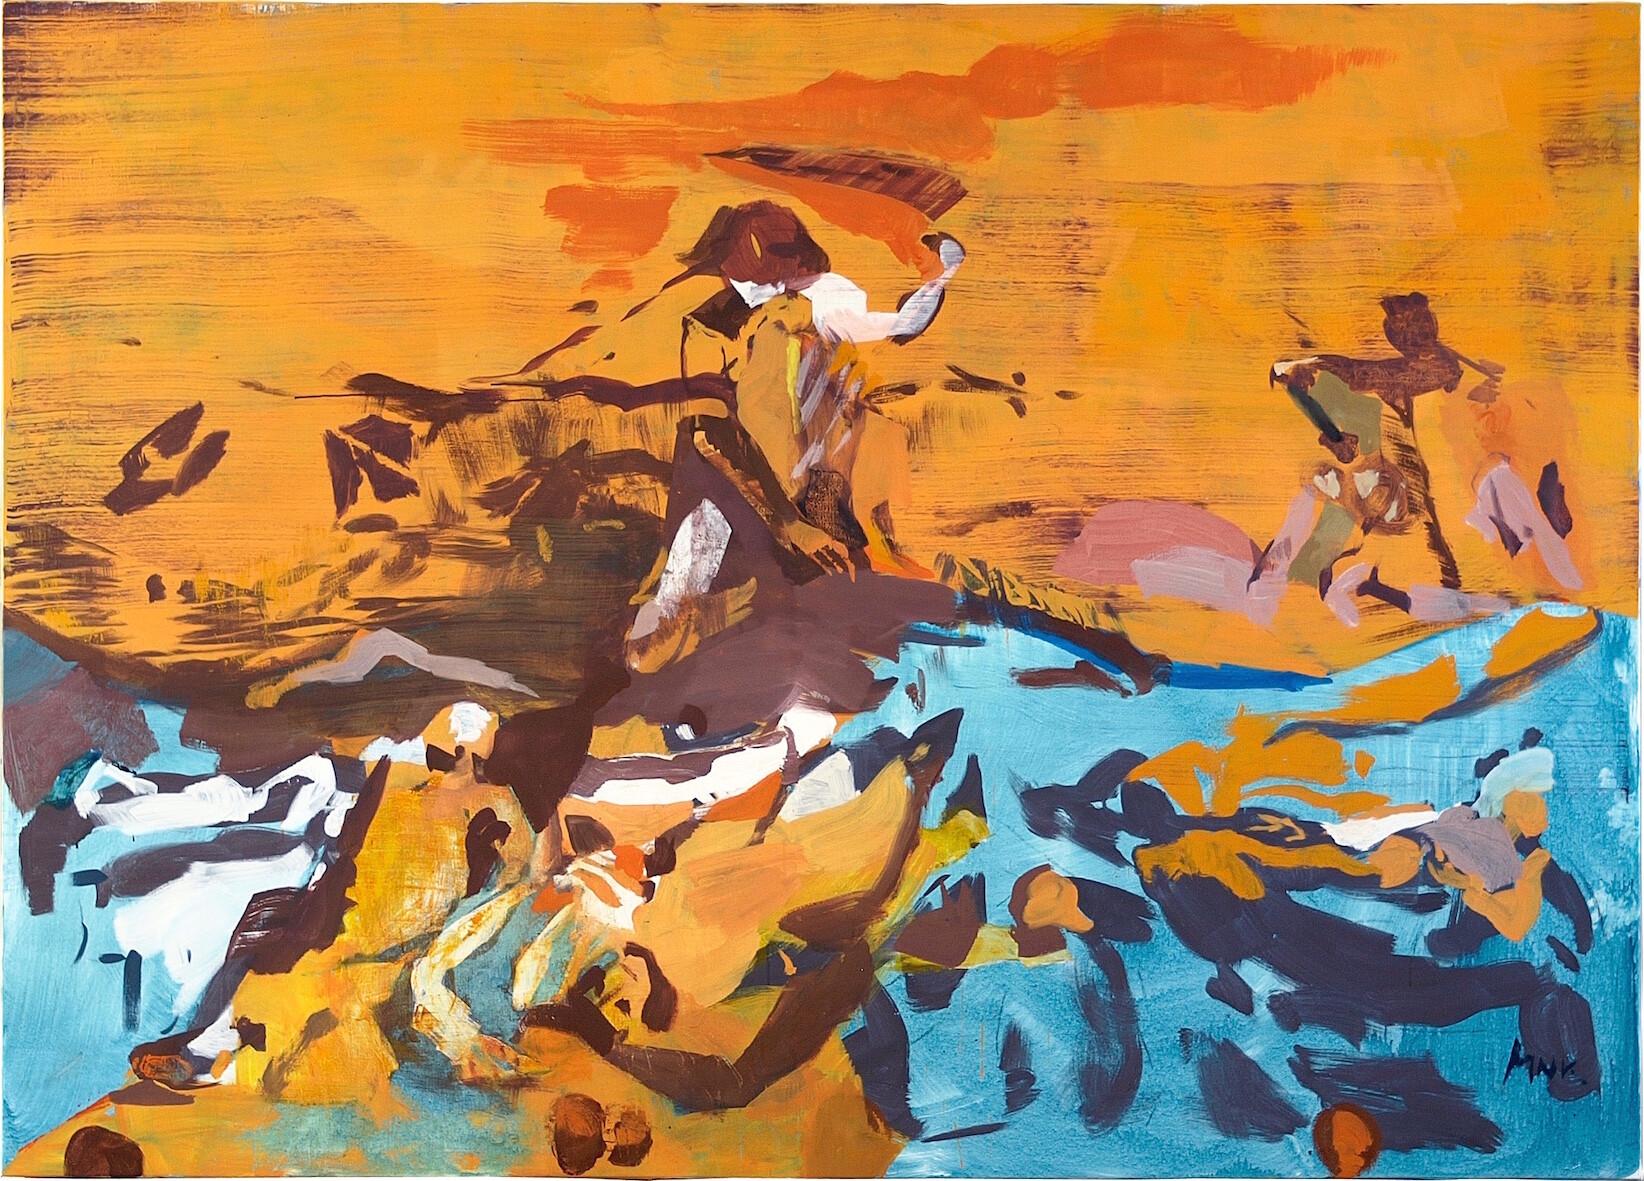 La Guerre VII, 2021, Öltempera auf Leinwand, 180 x 250 cm